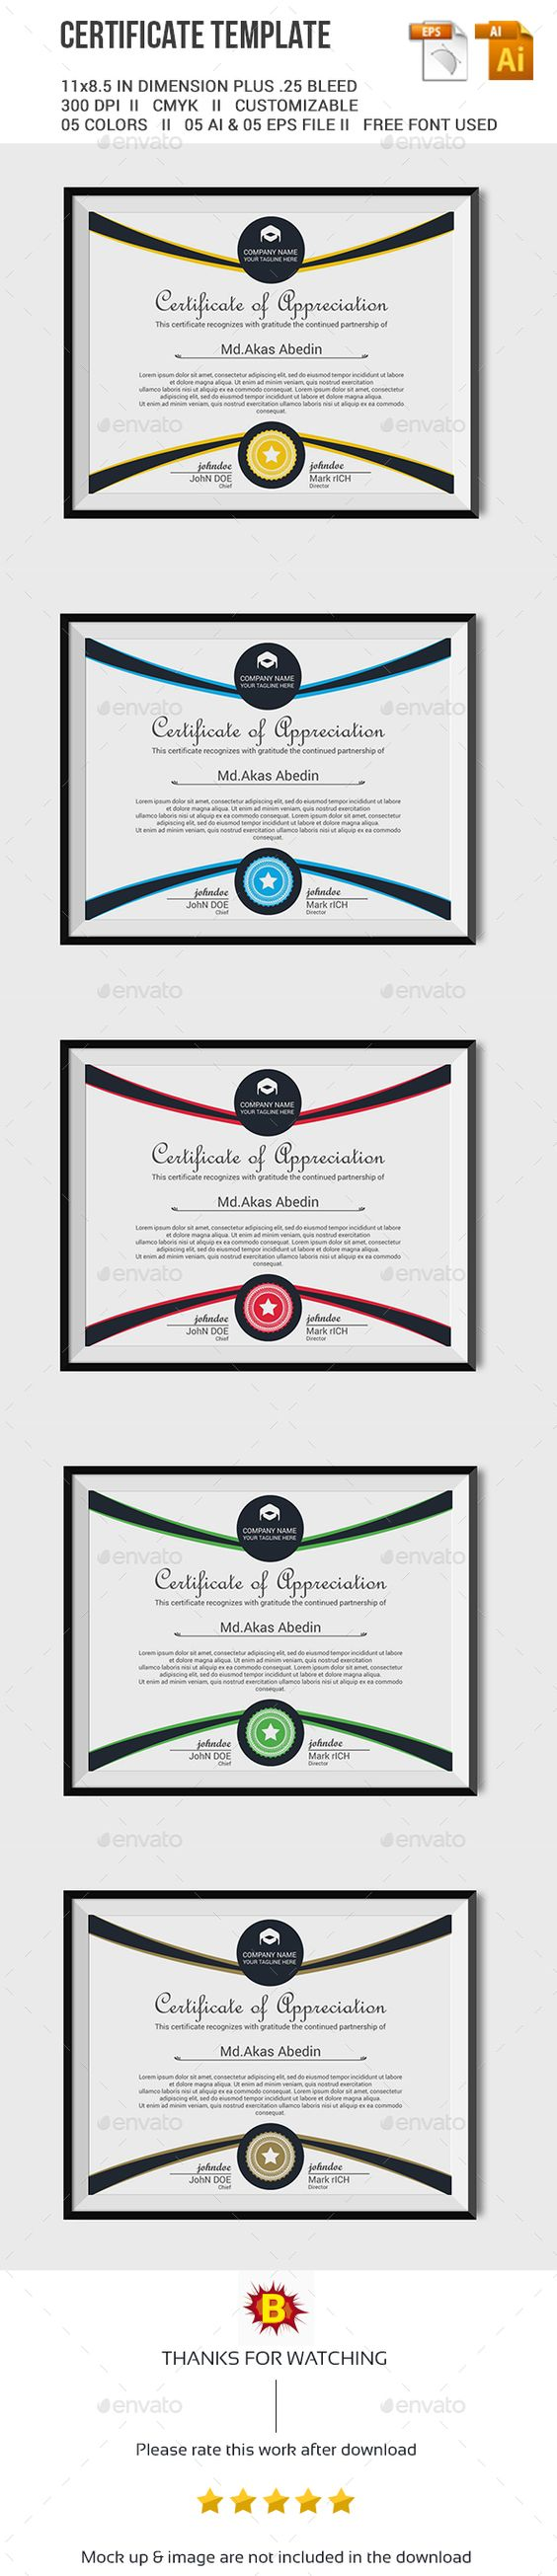 Blank Certificates Templates Free Download Interesting Kadir Khan Justkadir On Pinterest